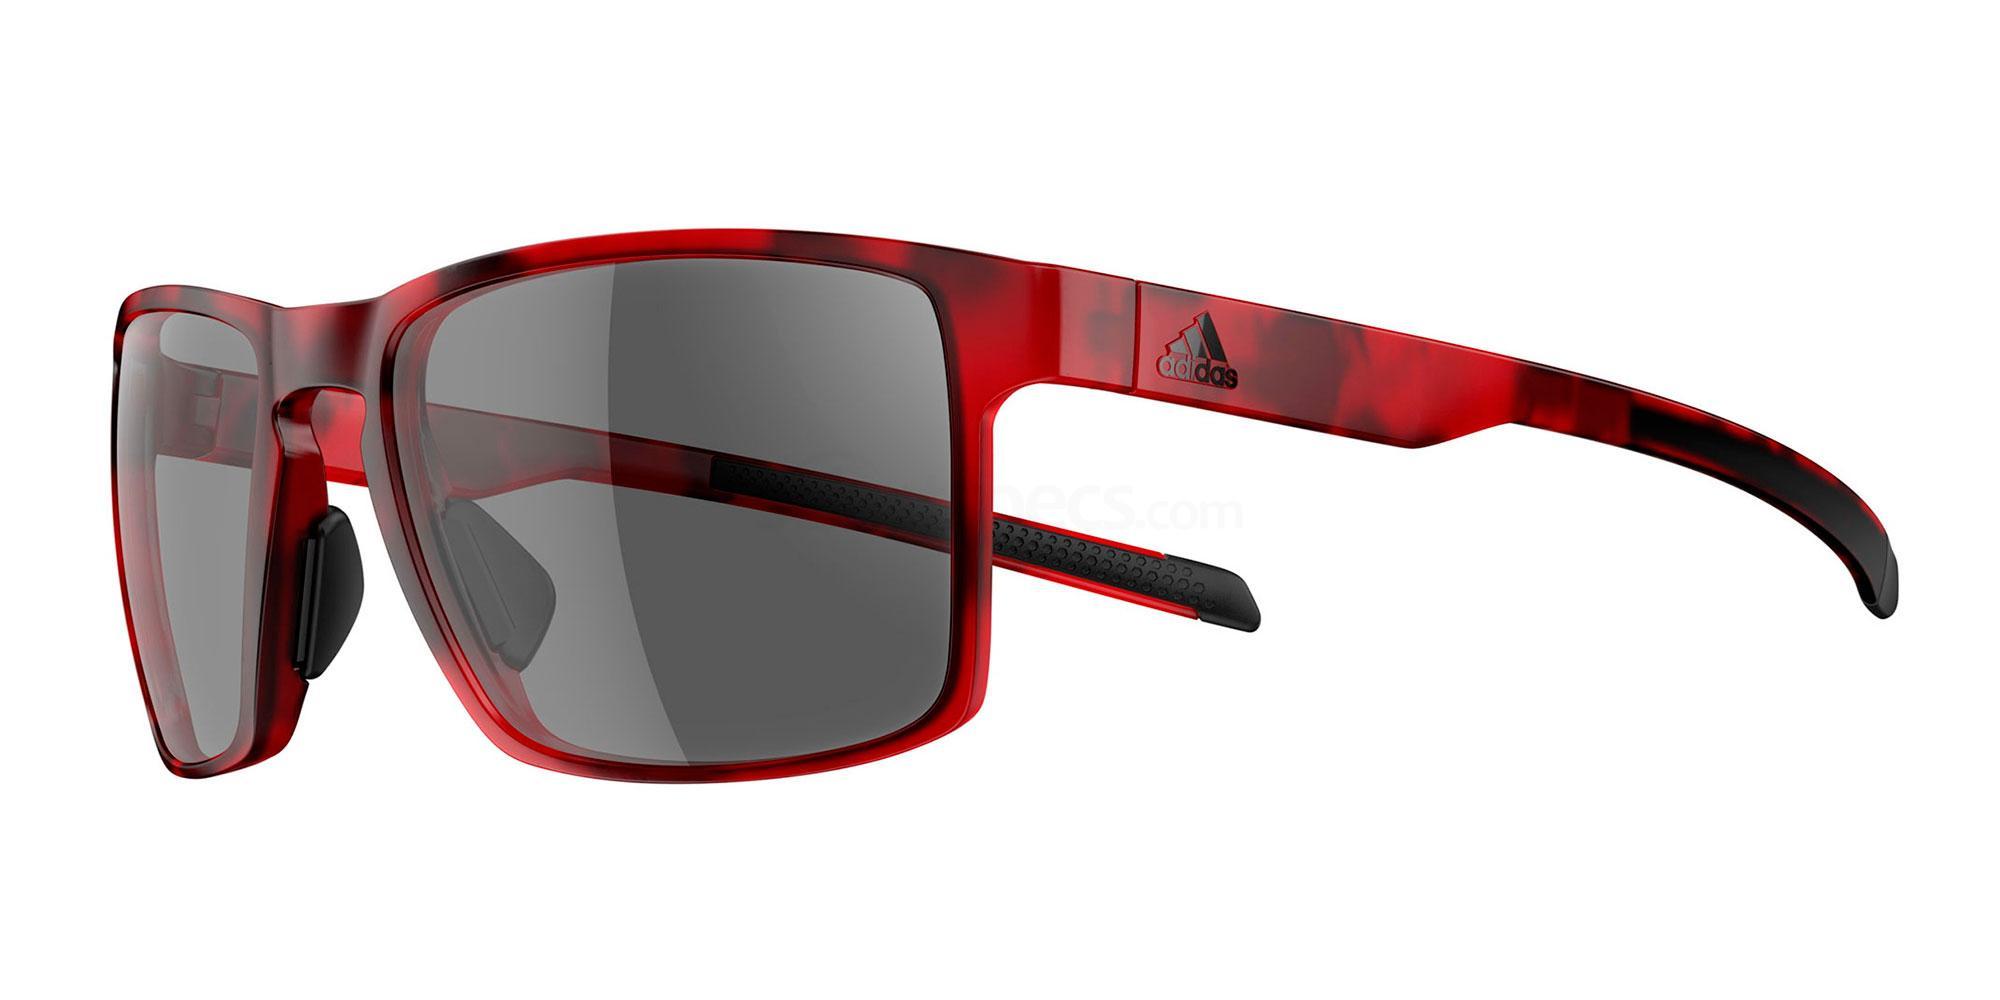 ad30 75 3000 ad30 Wayfinder Sunglasses, Adidas